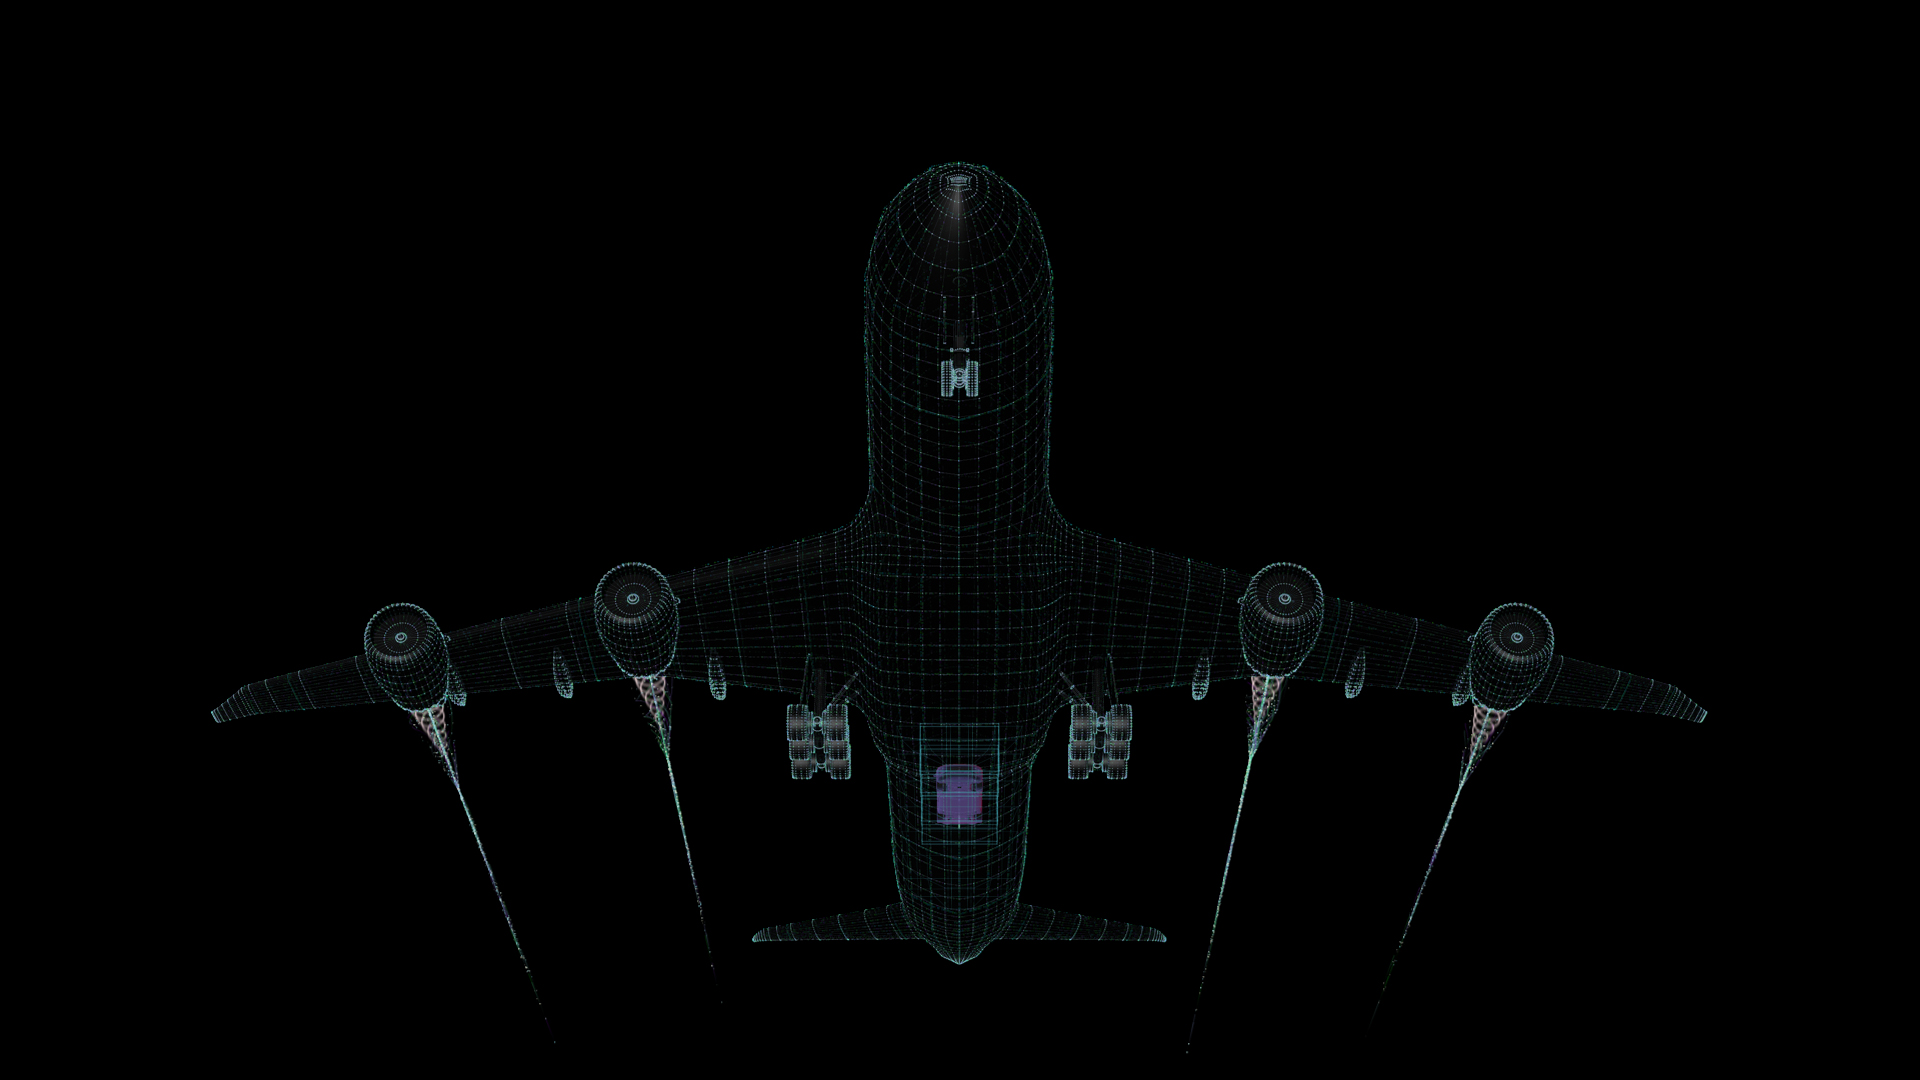 Plane_Underneath.jpg